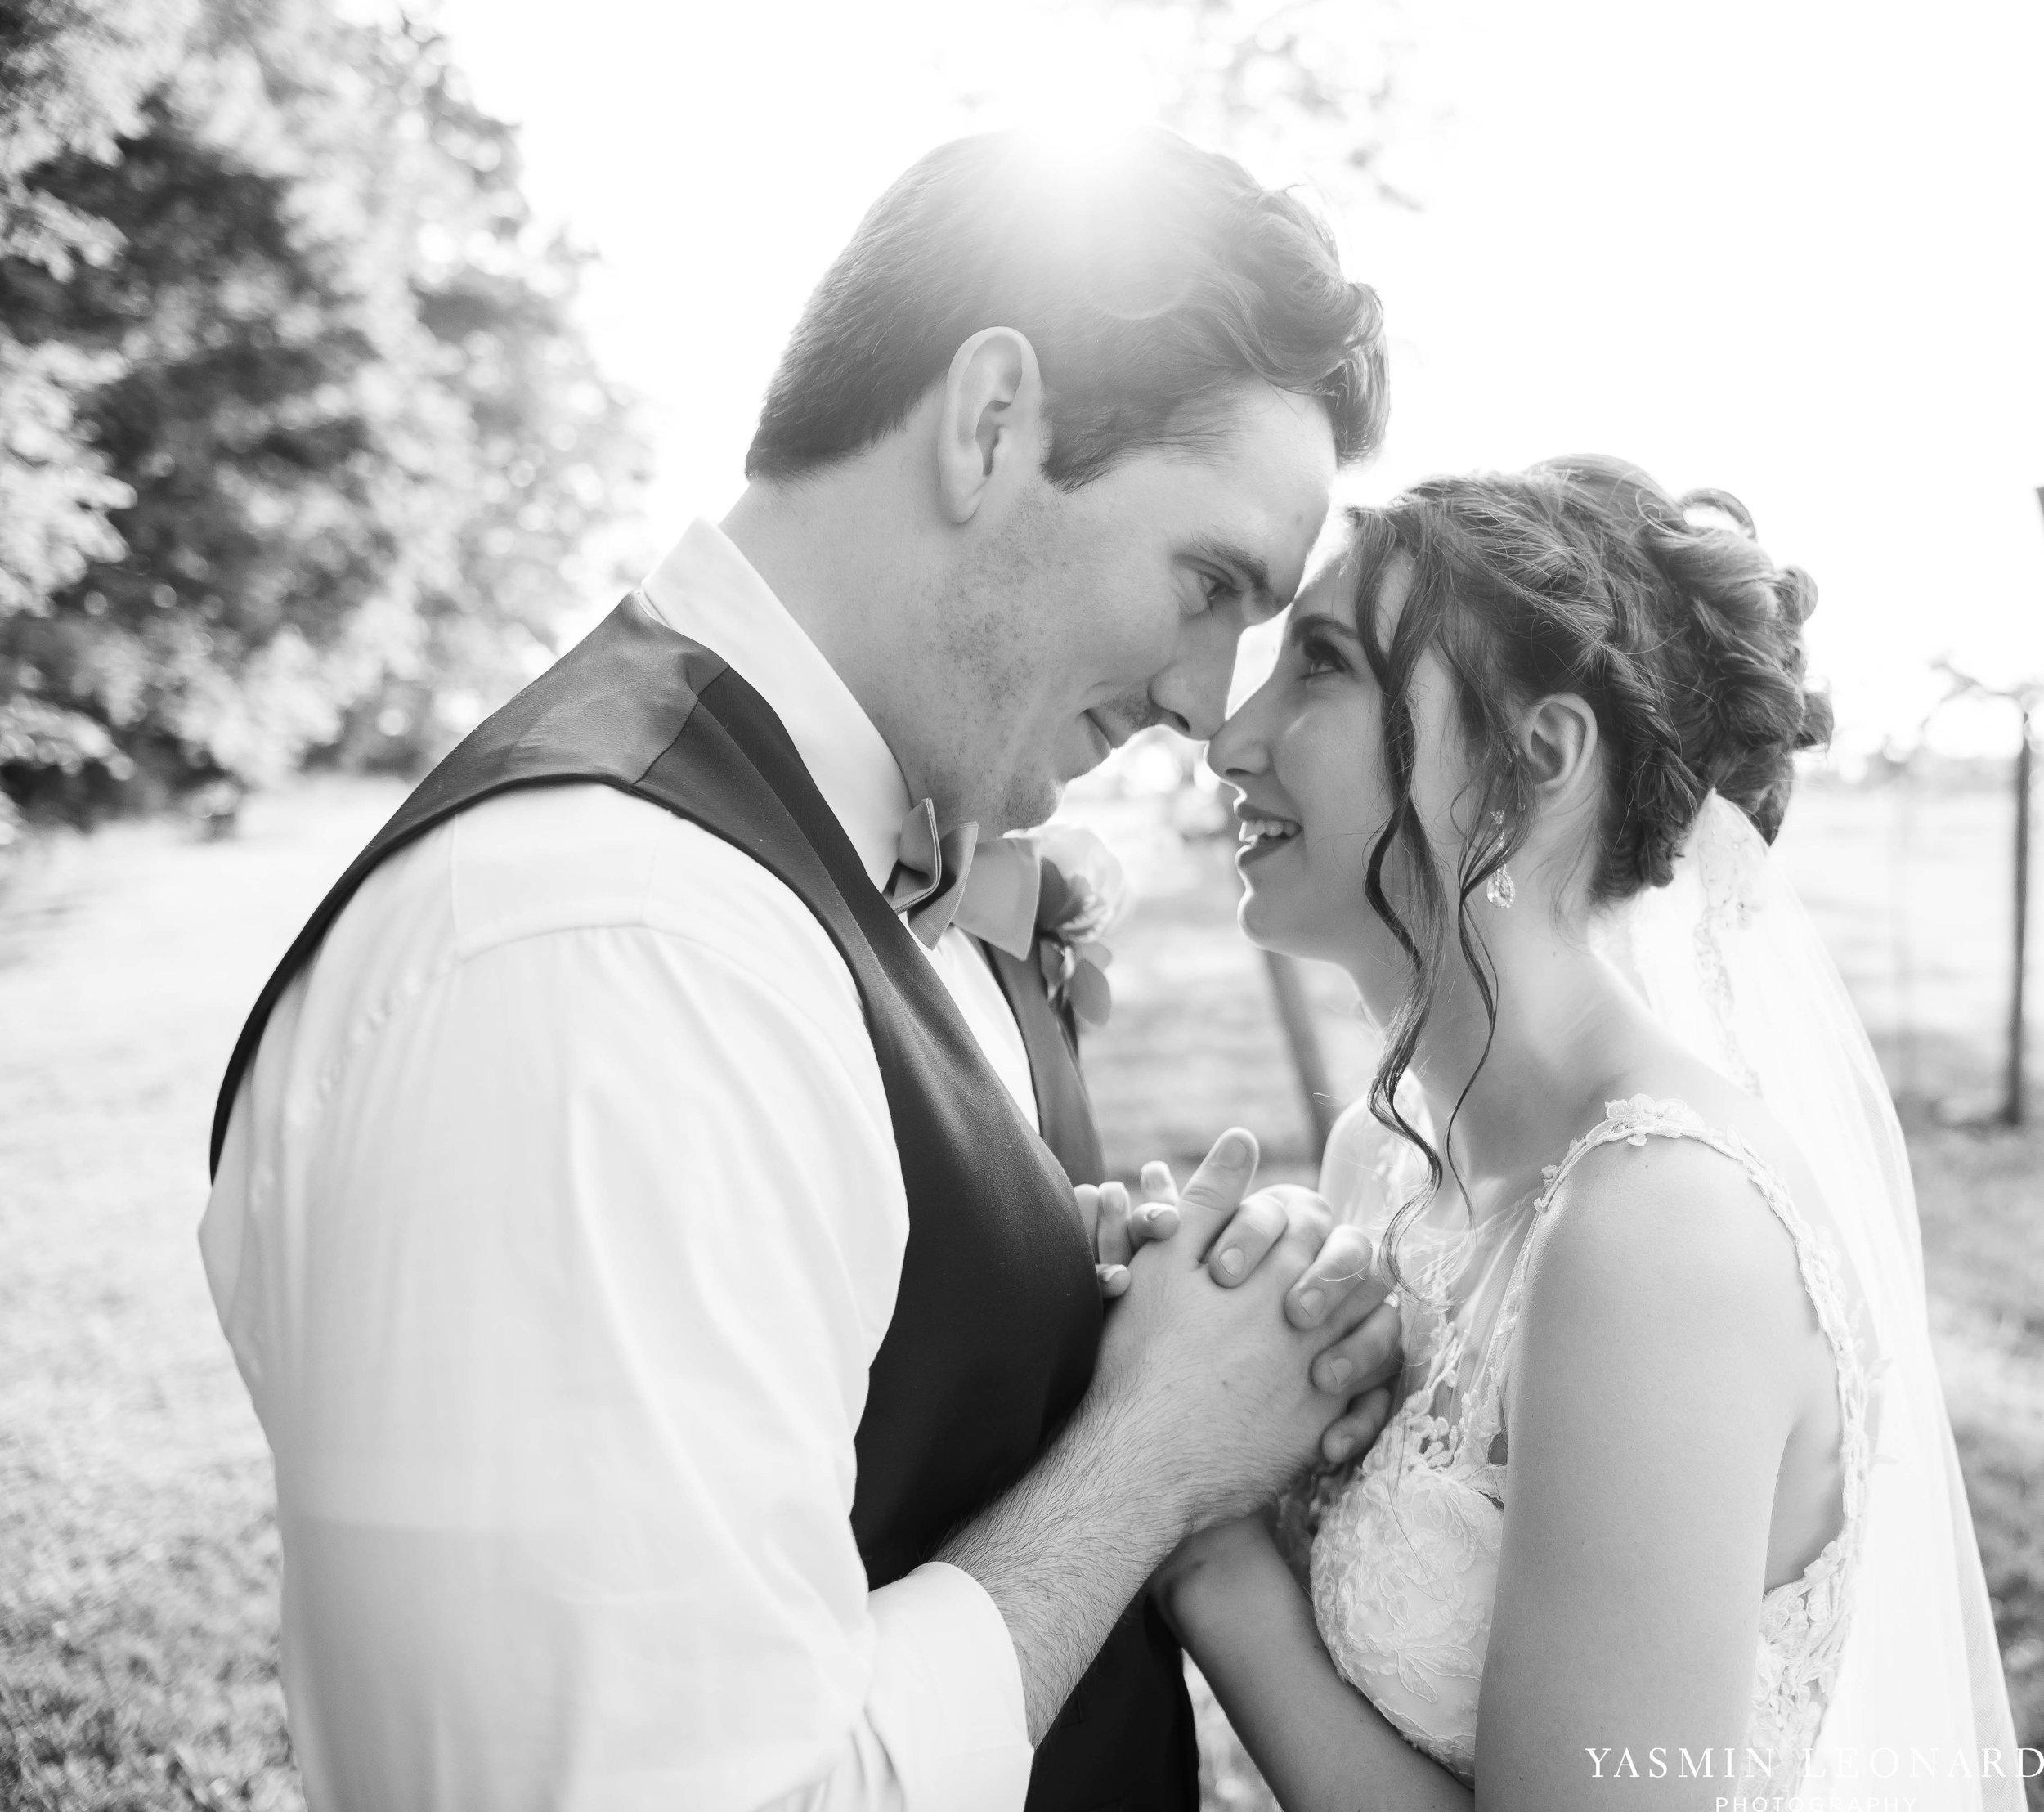 Old Homeplace Vineyard - NC Weddings - Outdoor Summer Weddings - Peony Boutique - Vineyard Wedding - NC Photographer - Yasmin Leonard Photography-47.jpg